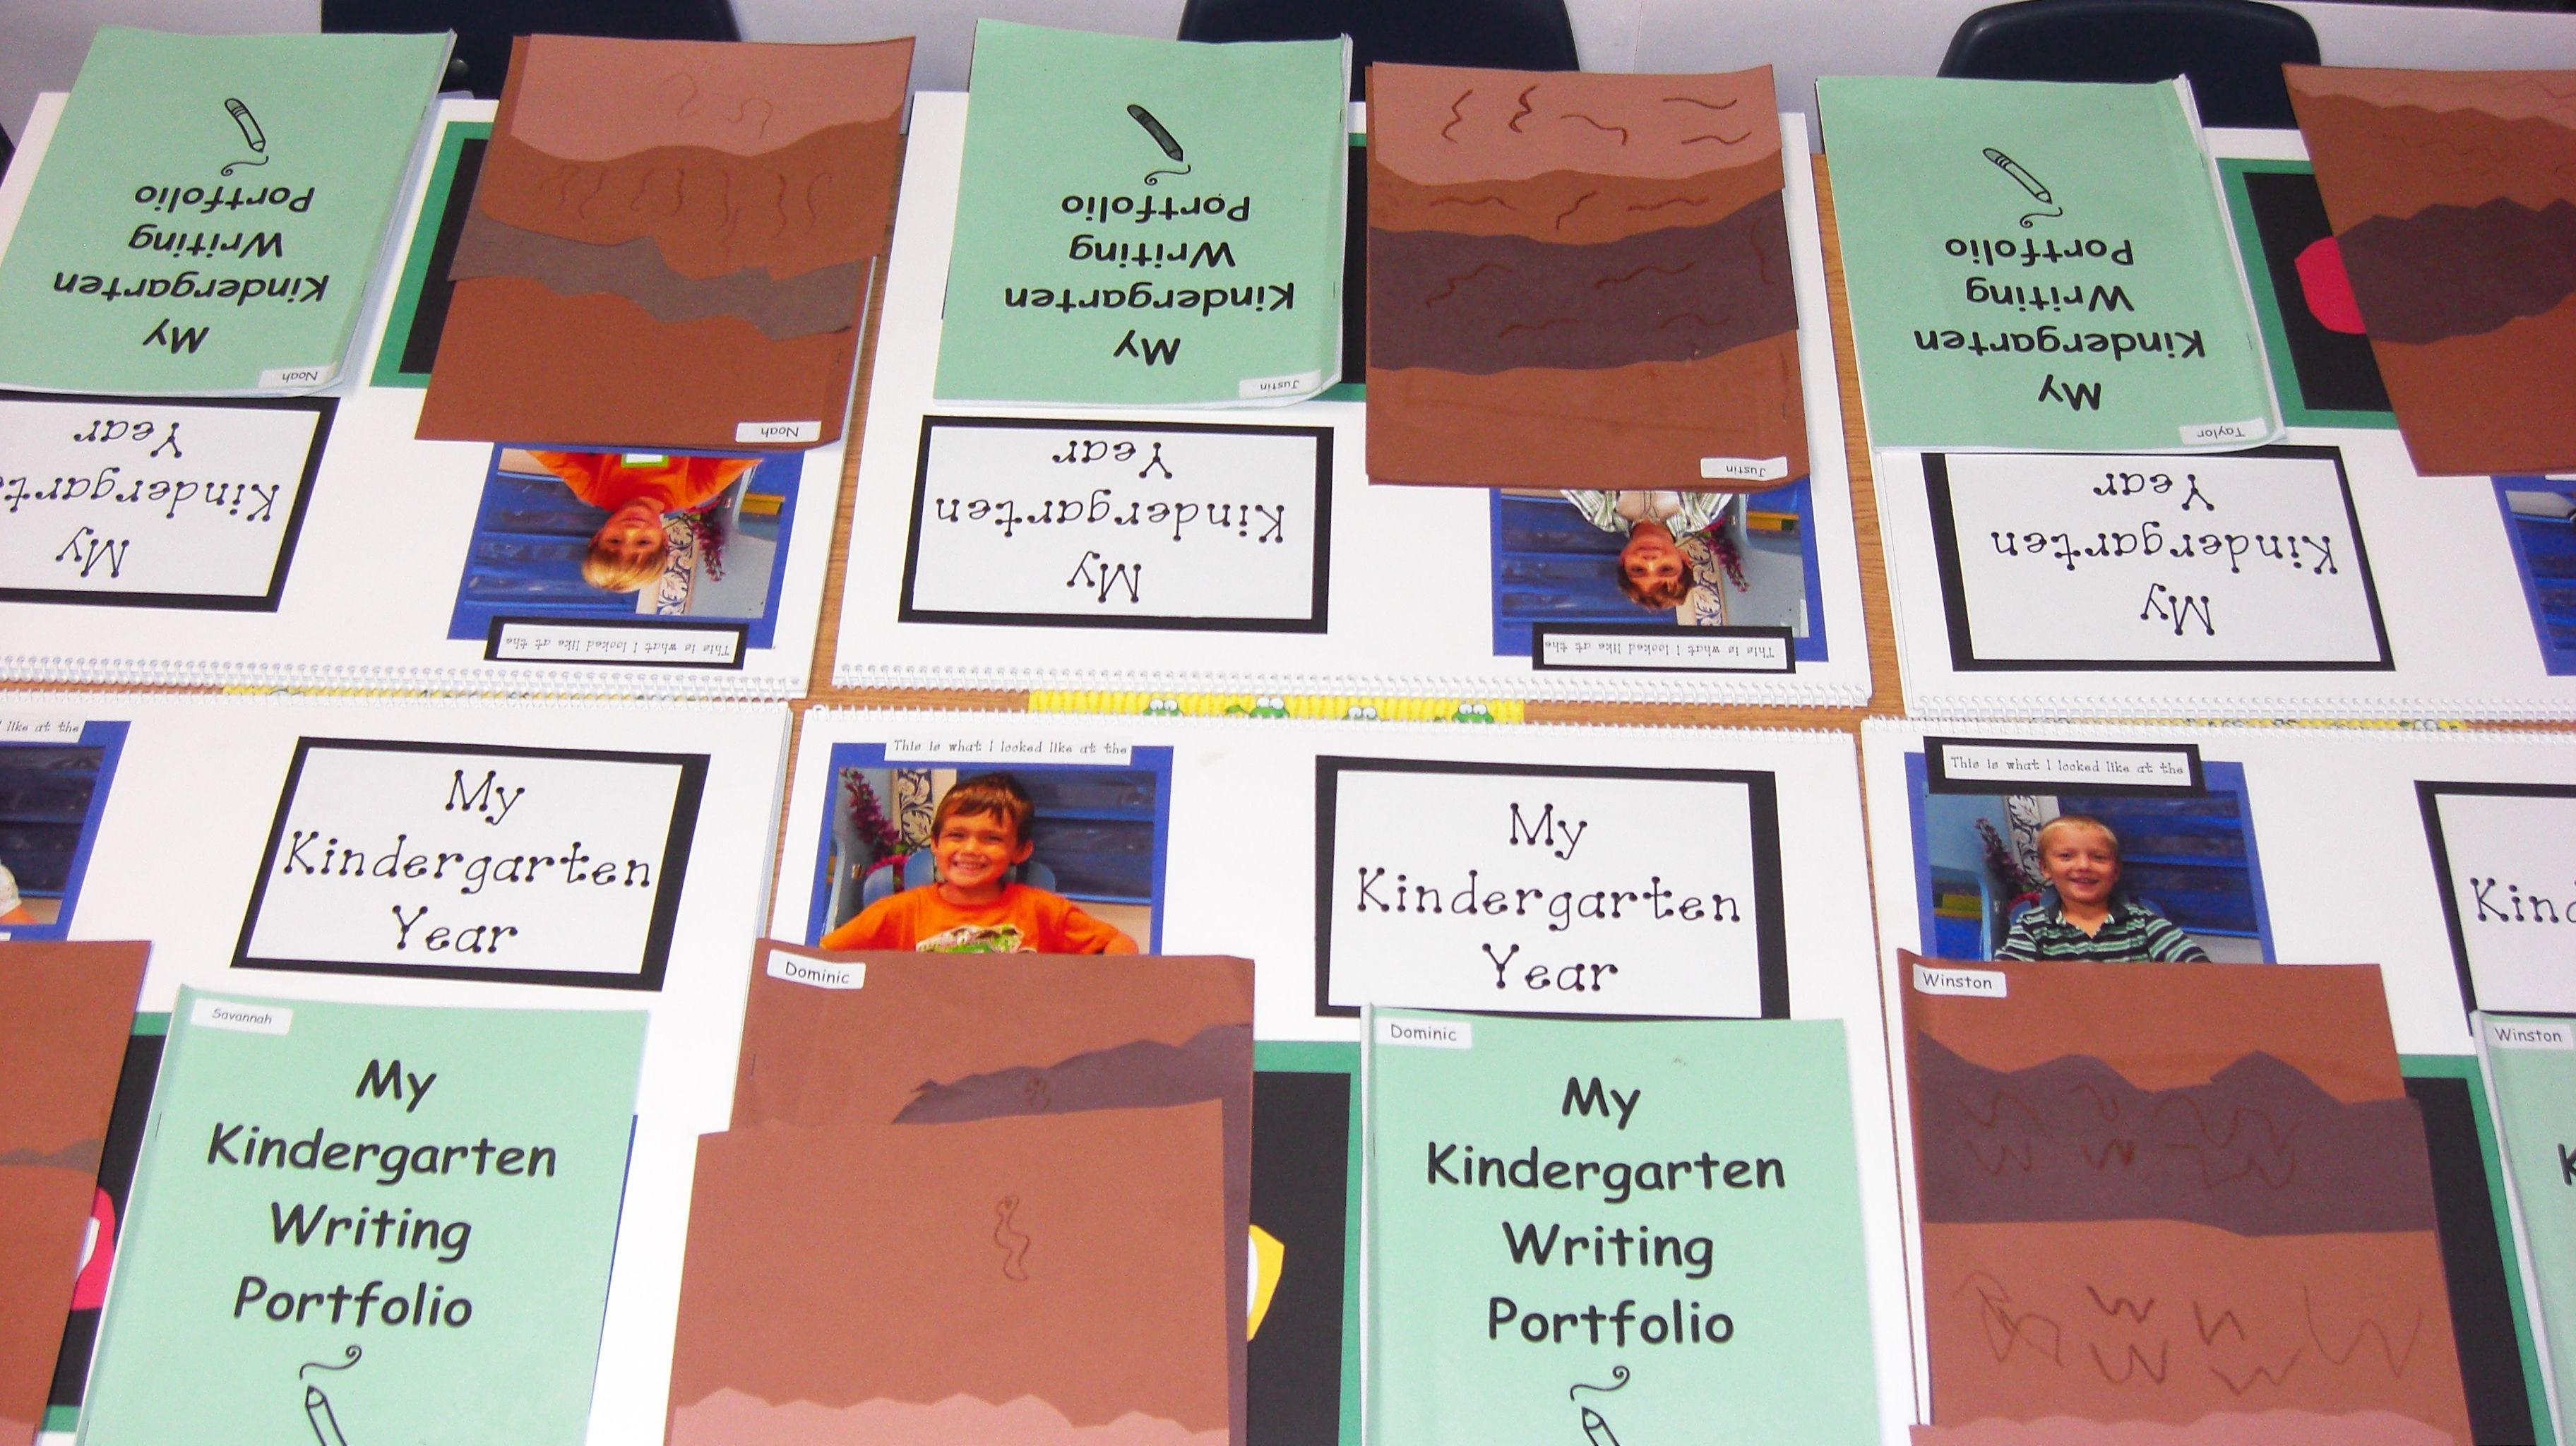 Diary Of A Worm Journals Writing Portfolio Children